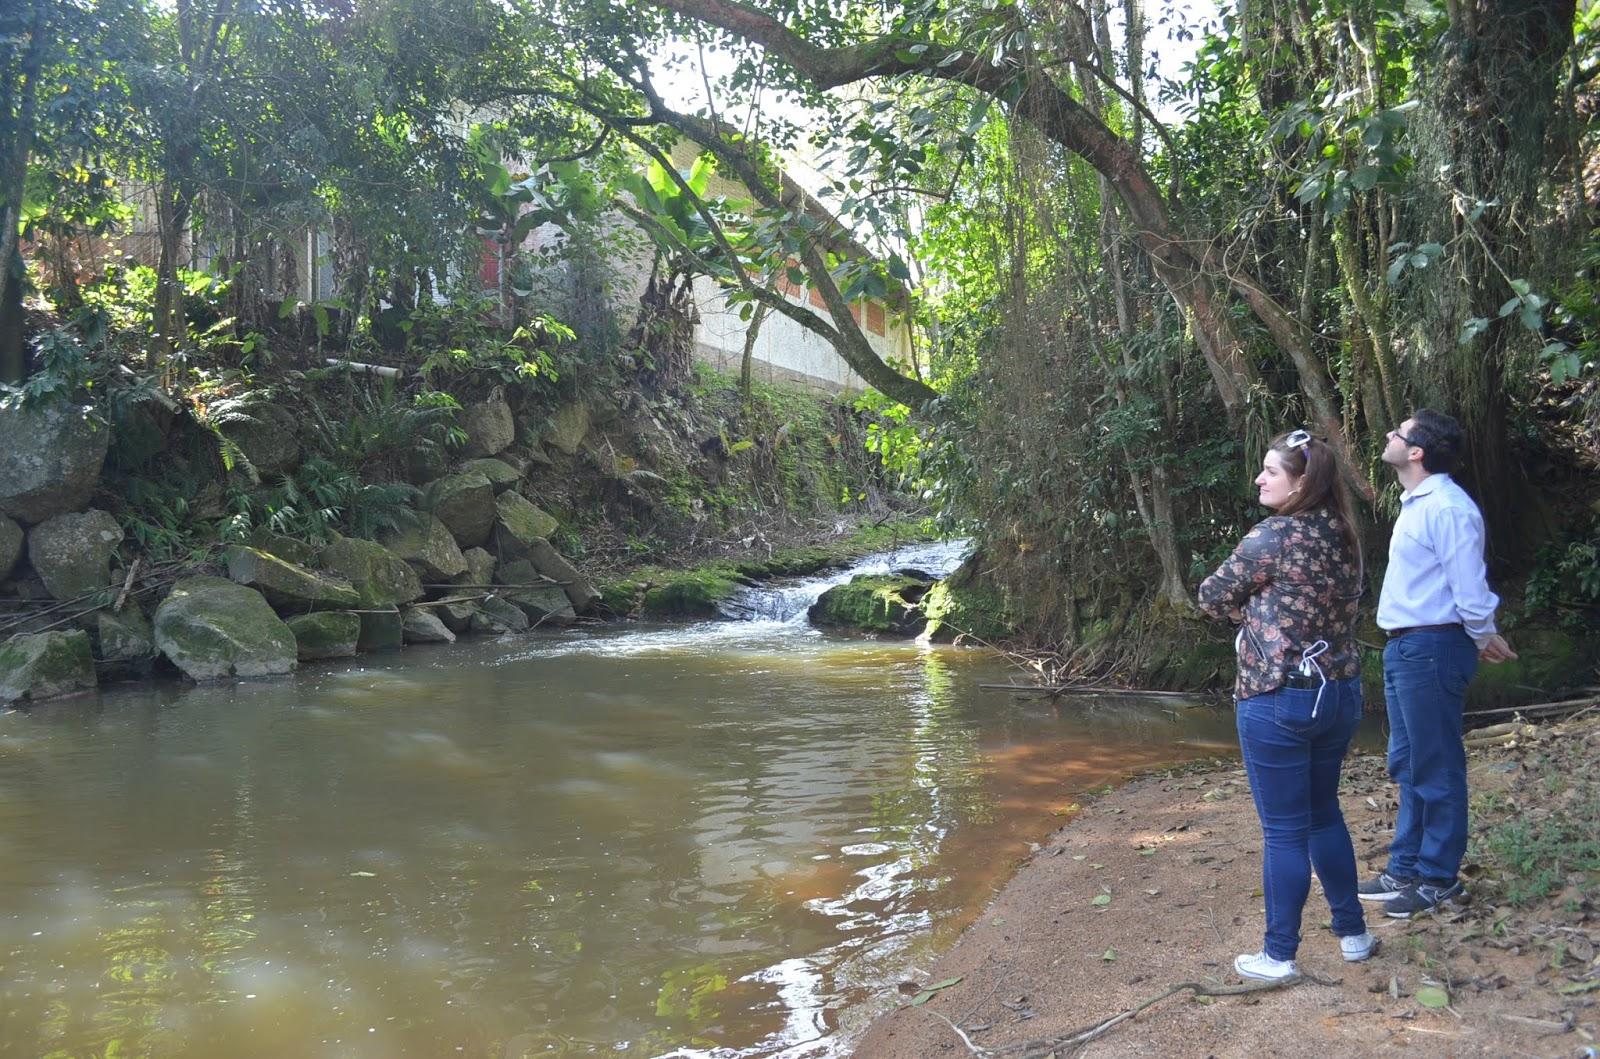 onde nasce o Rio Urussanga